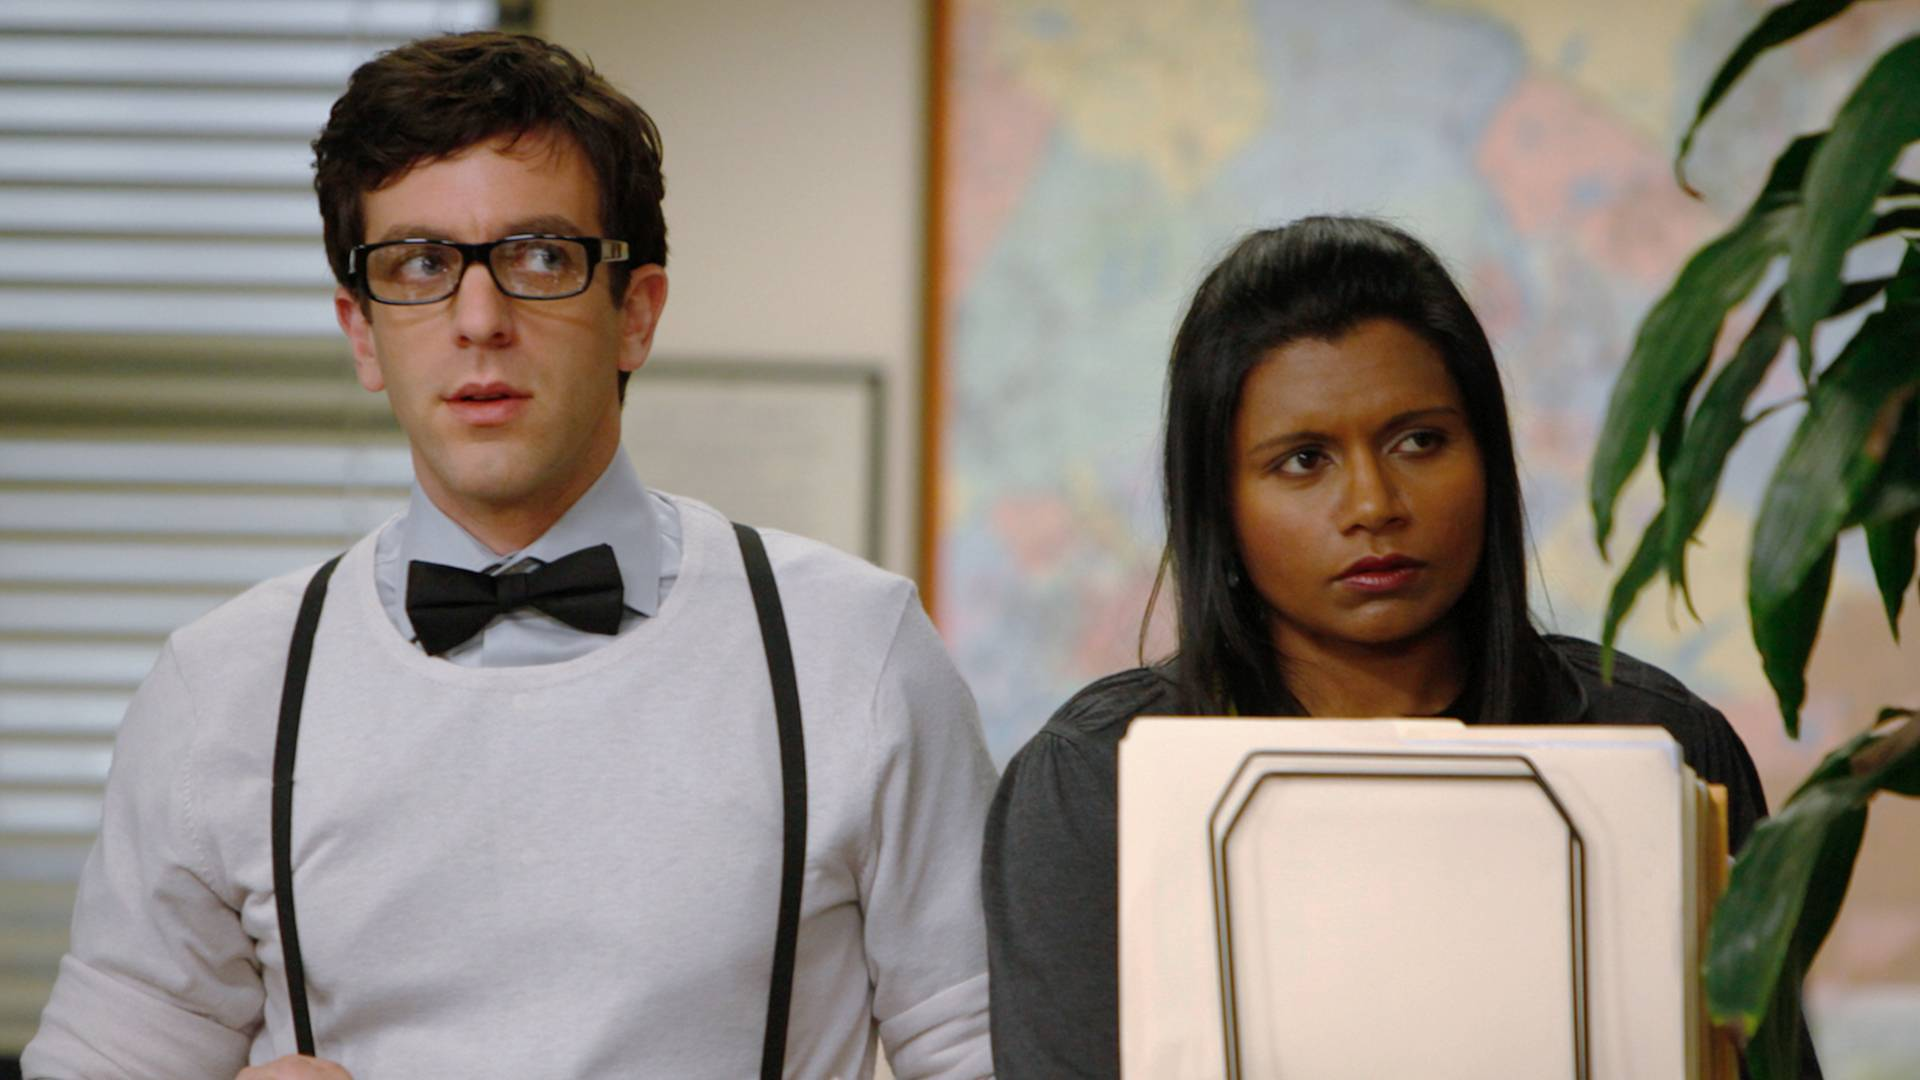 The Office Season 6 Episode 26